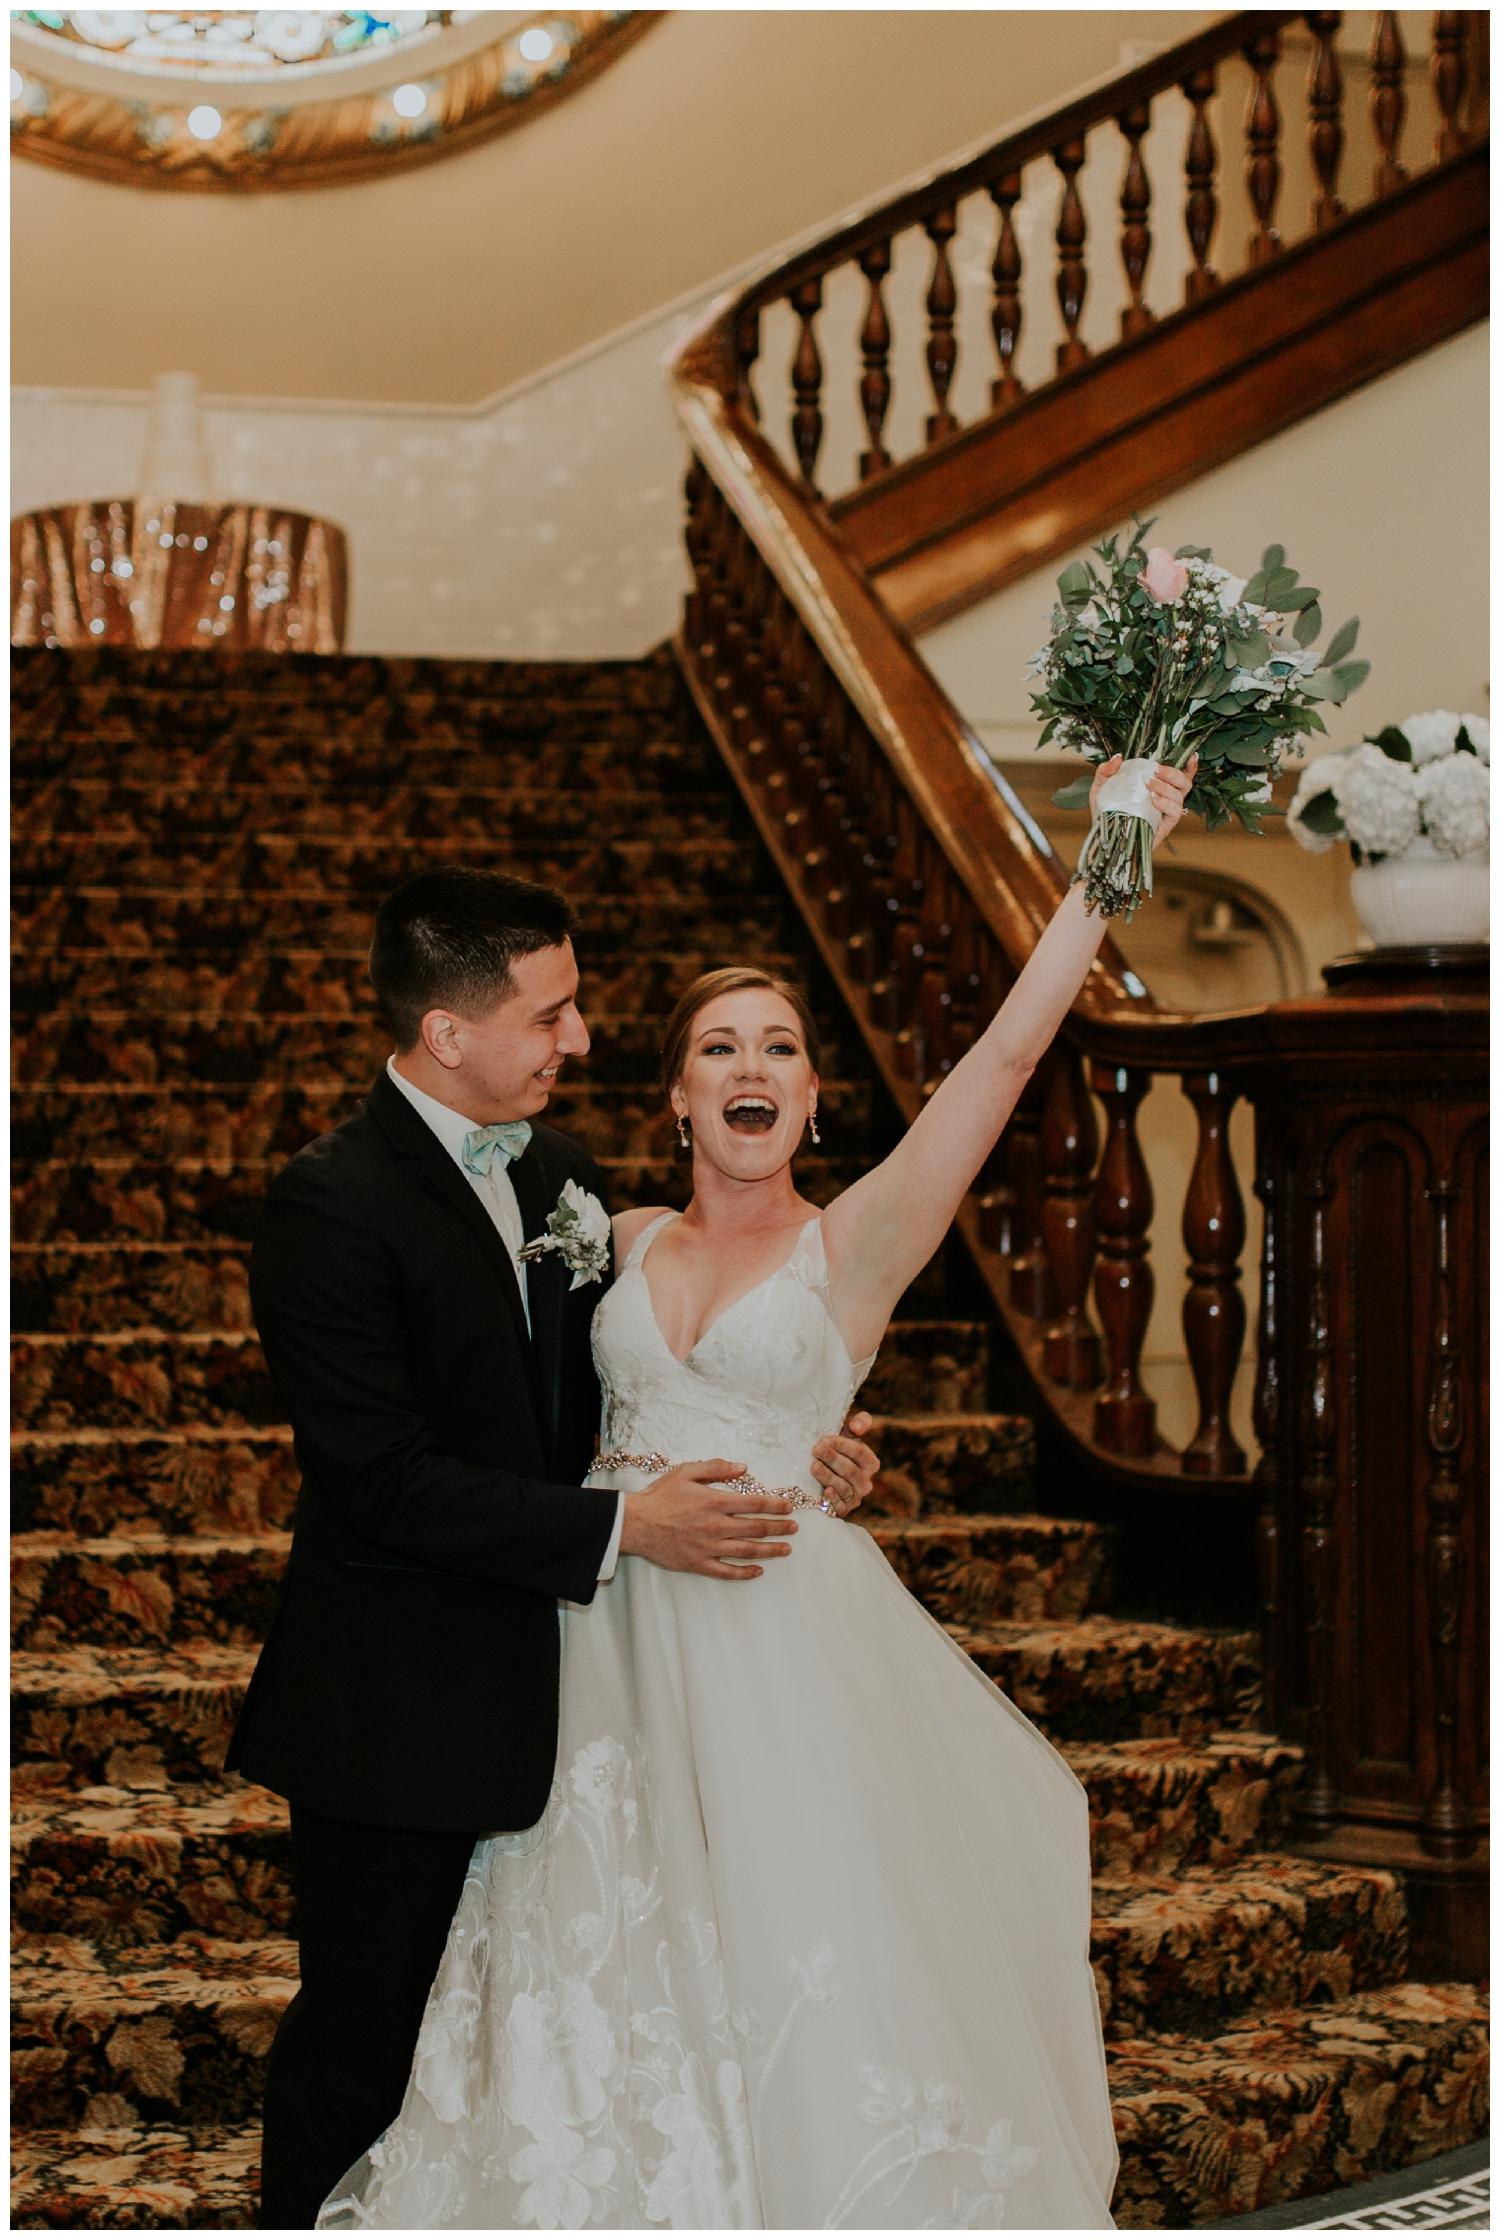 Jenna+Brandon, Mission Concepcion Wedding, San Antonio, Contista Productions Wedding Photography_0134.jpg